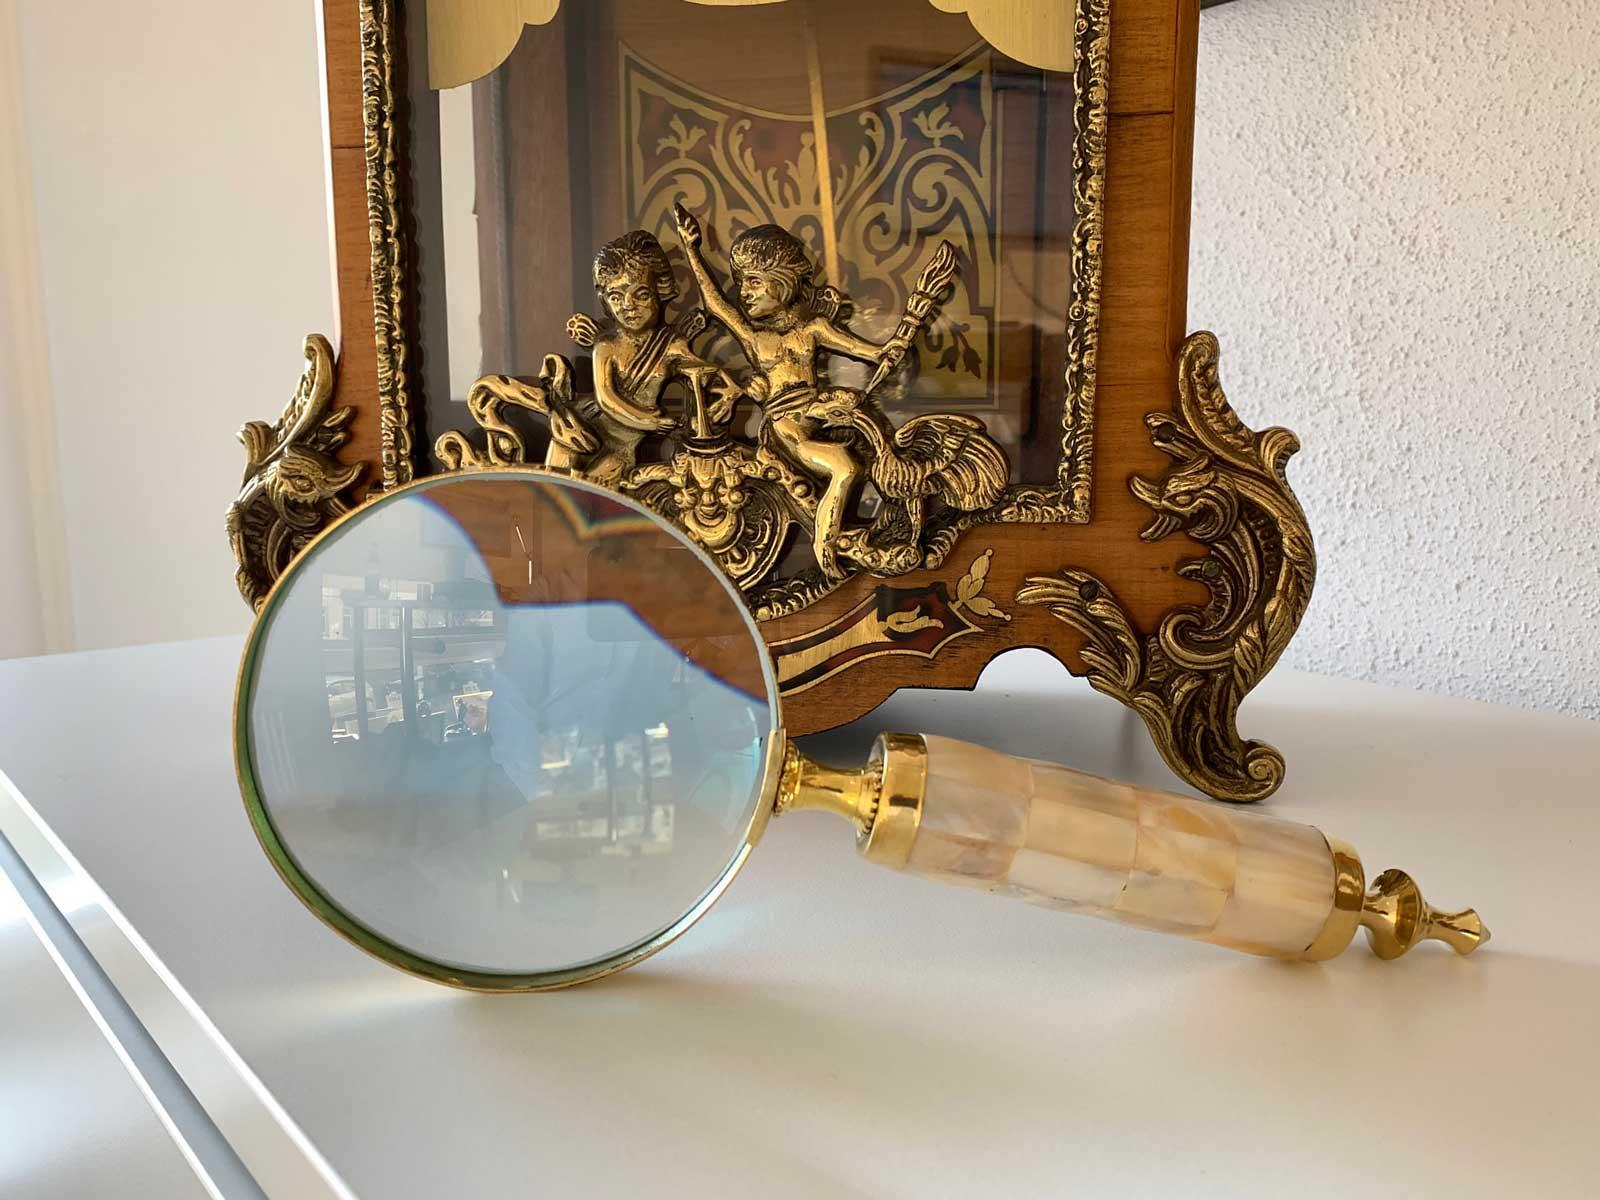 Lupe Leselupe Lesehilfe im Antik-Stil Handlupe Sehhilfe Vergrößerungsglas W24